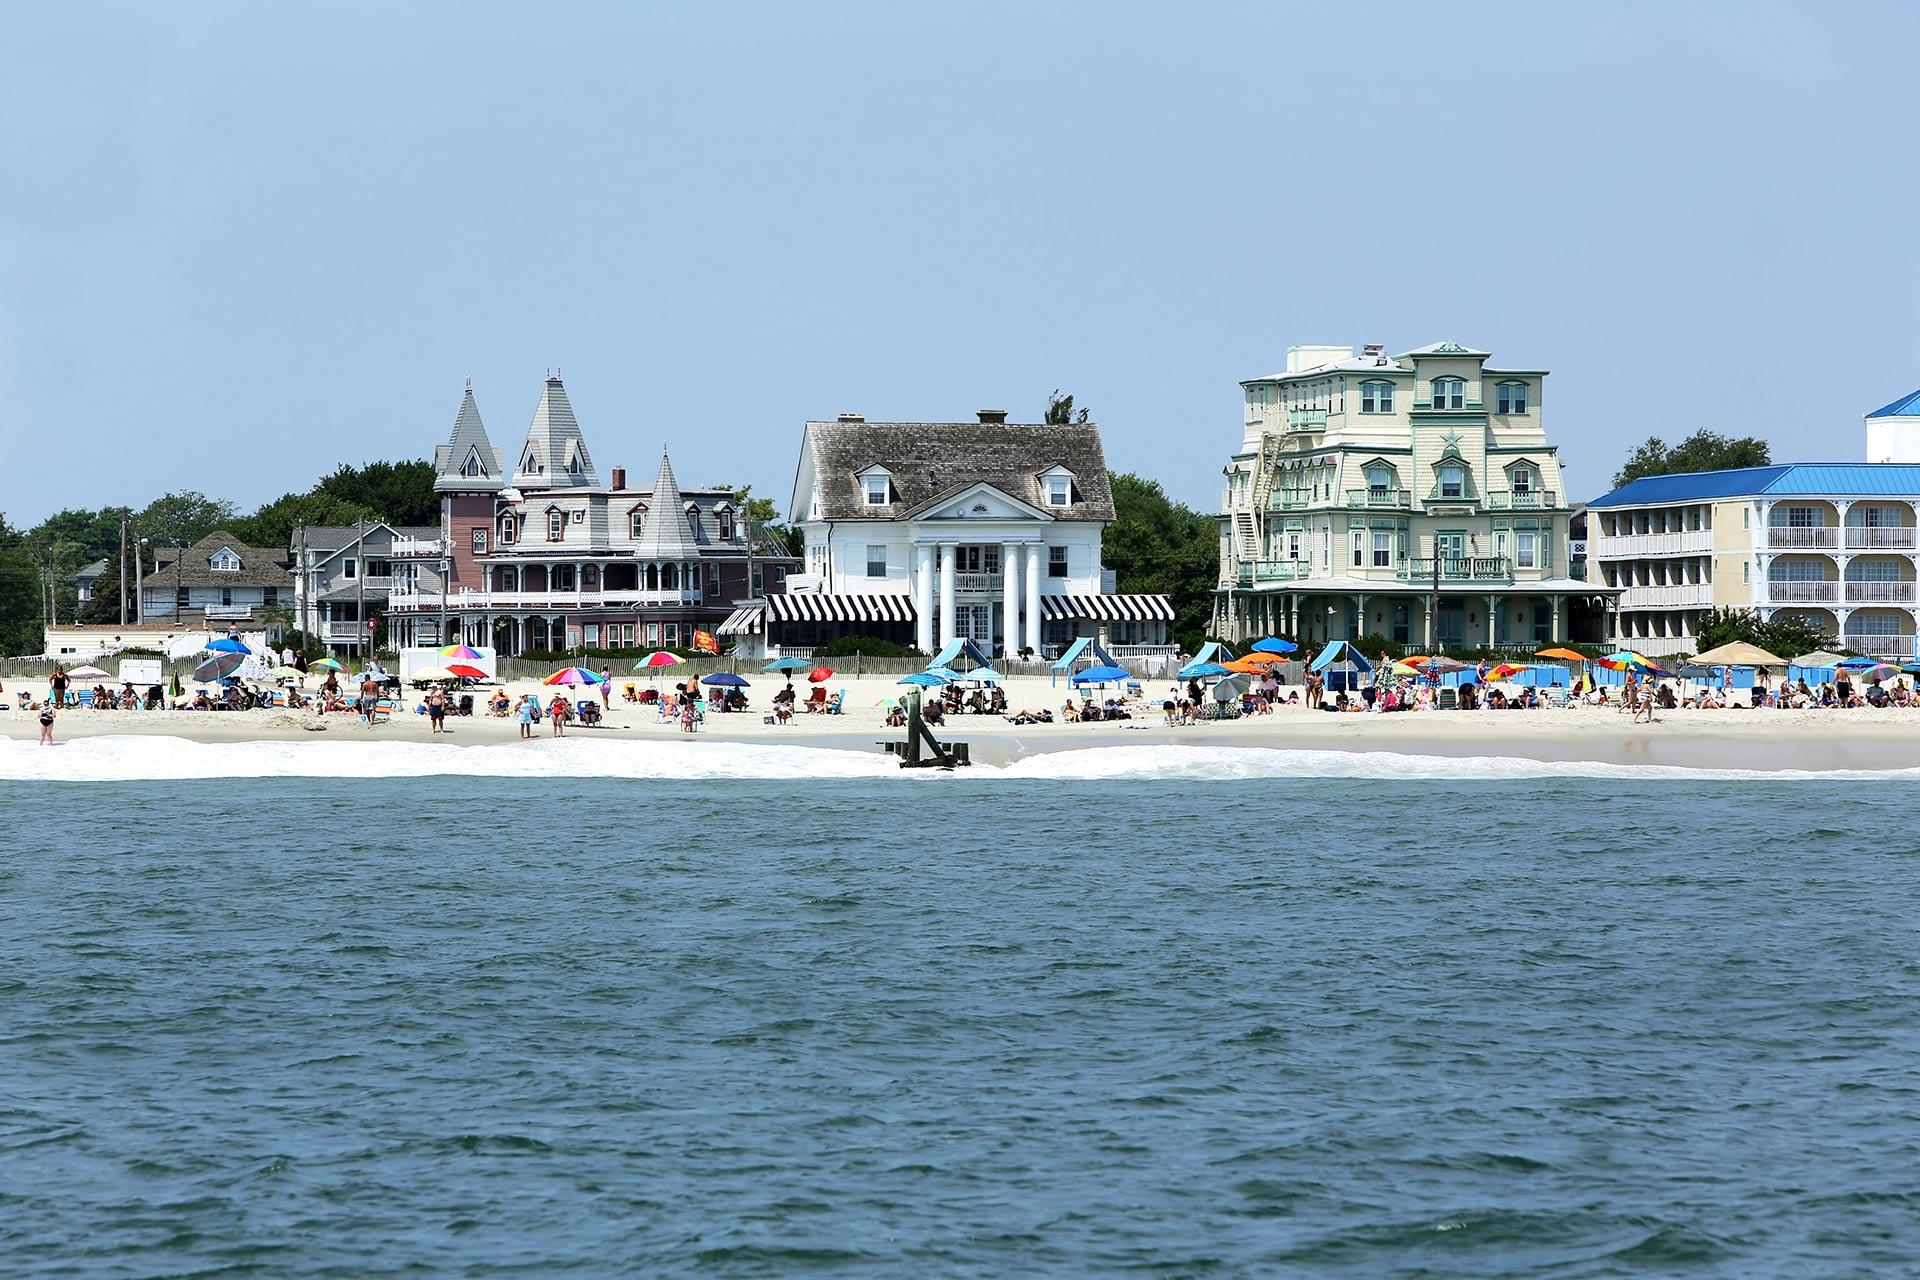 Cape May, New Jersey; Photo Courtesy of Rachael Grazias/Shutterstock.com